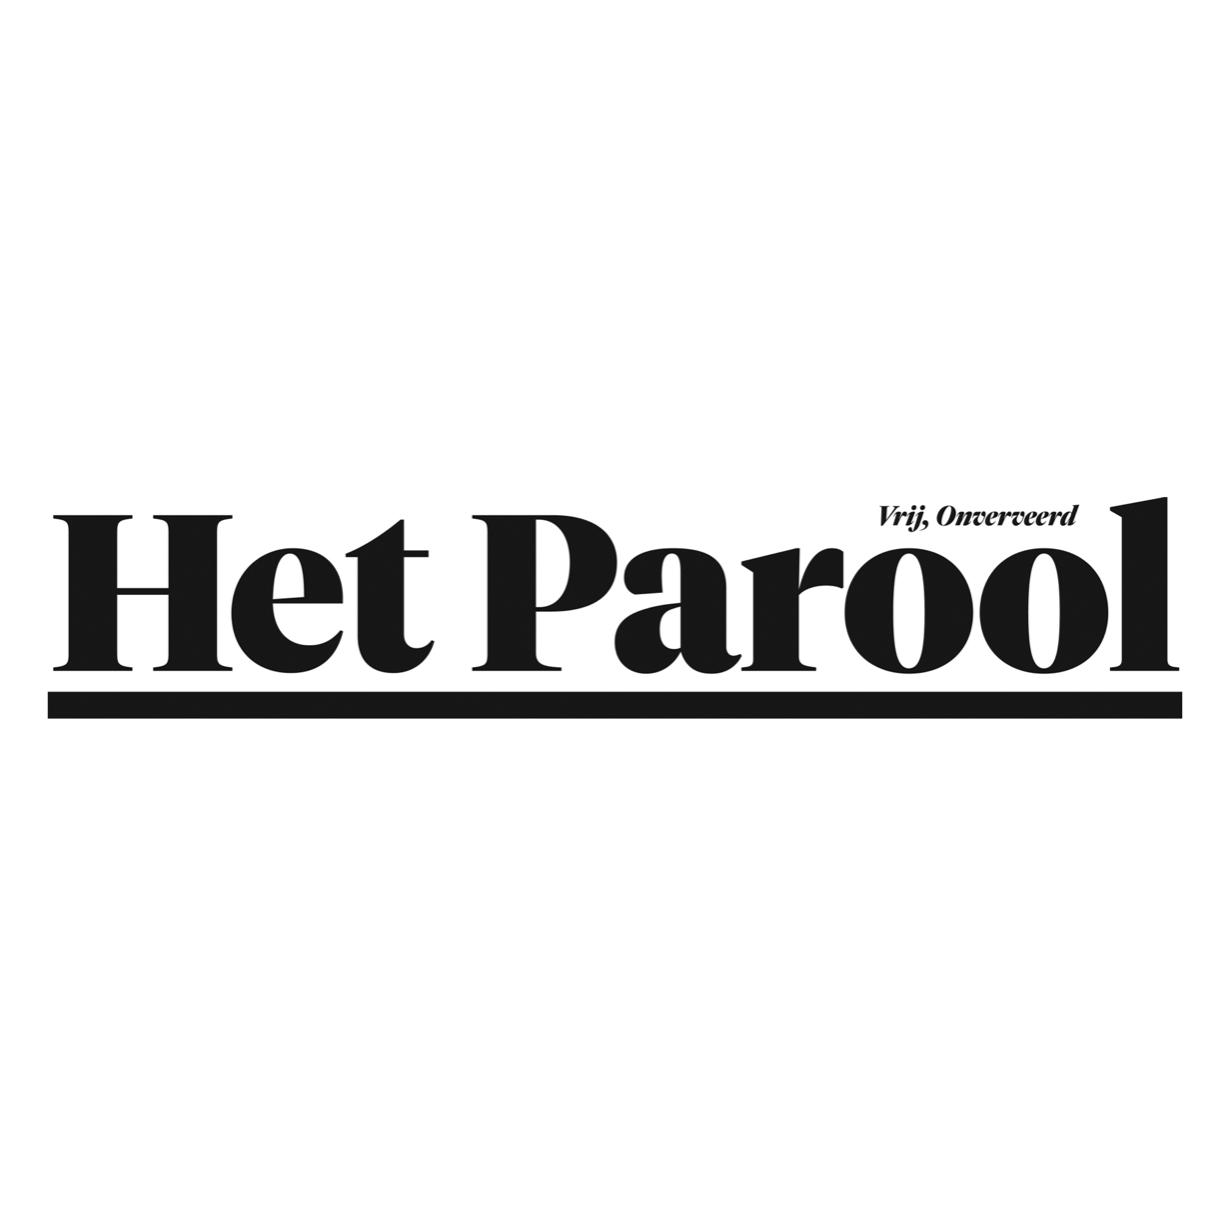 Het Parool logo joostbastmeijer.png